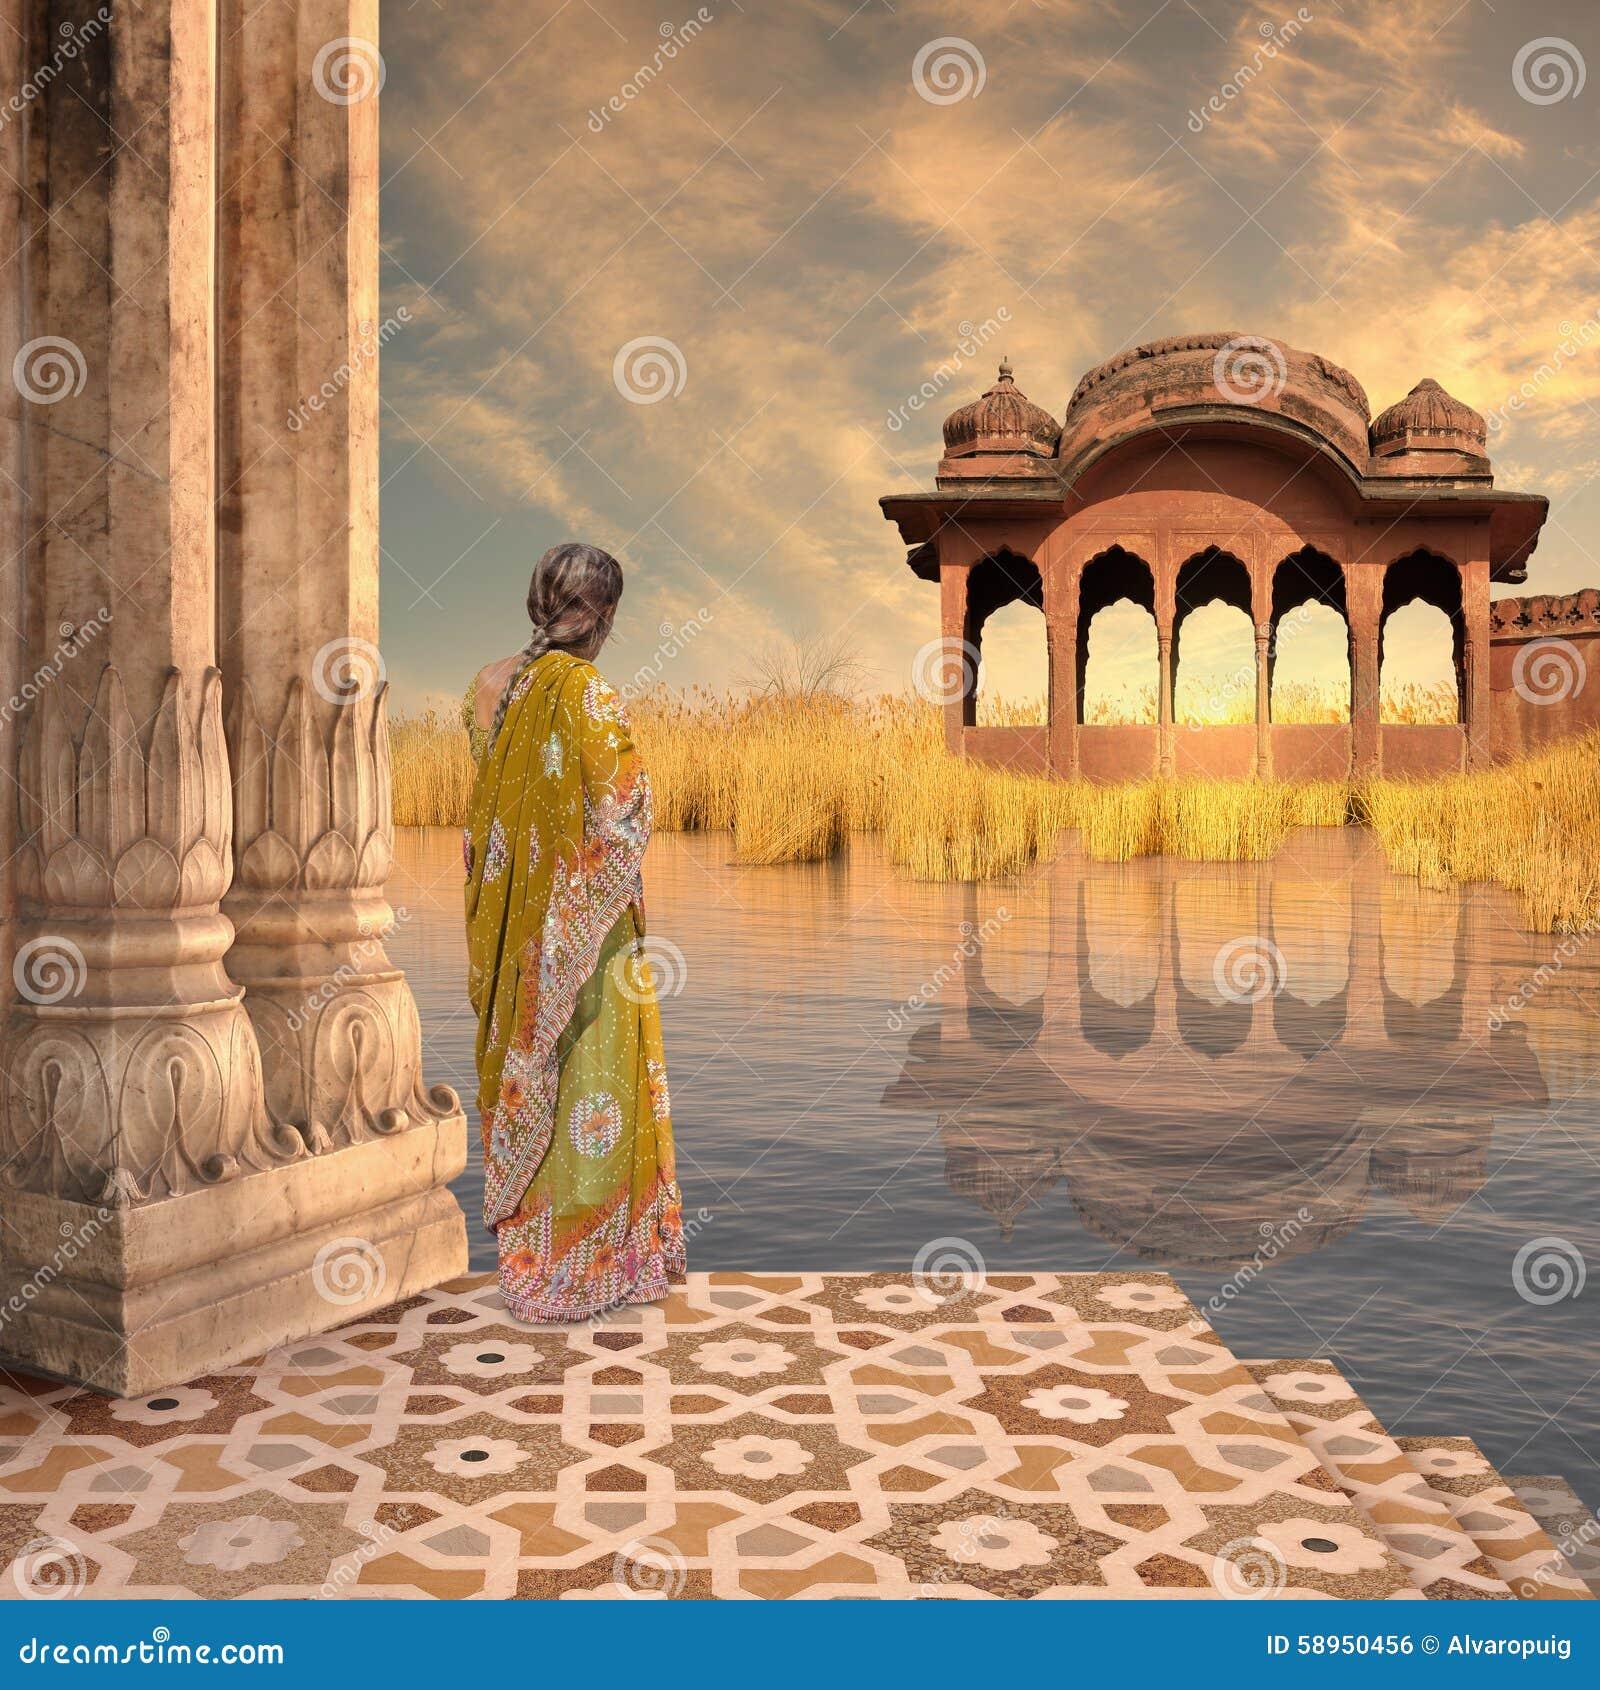 hindu single women in indian lake Girls for marriage single pakistani/ indian men in usa uk canada for shadi, london, united kingdom 86k likes pakistani matchmaker, indian.